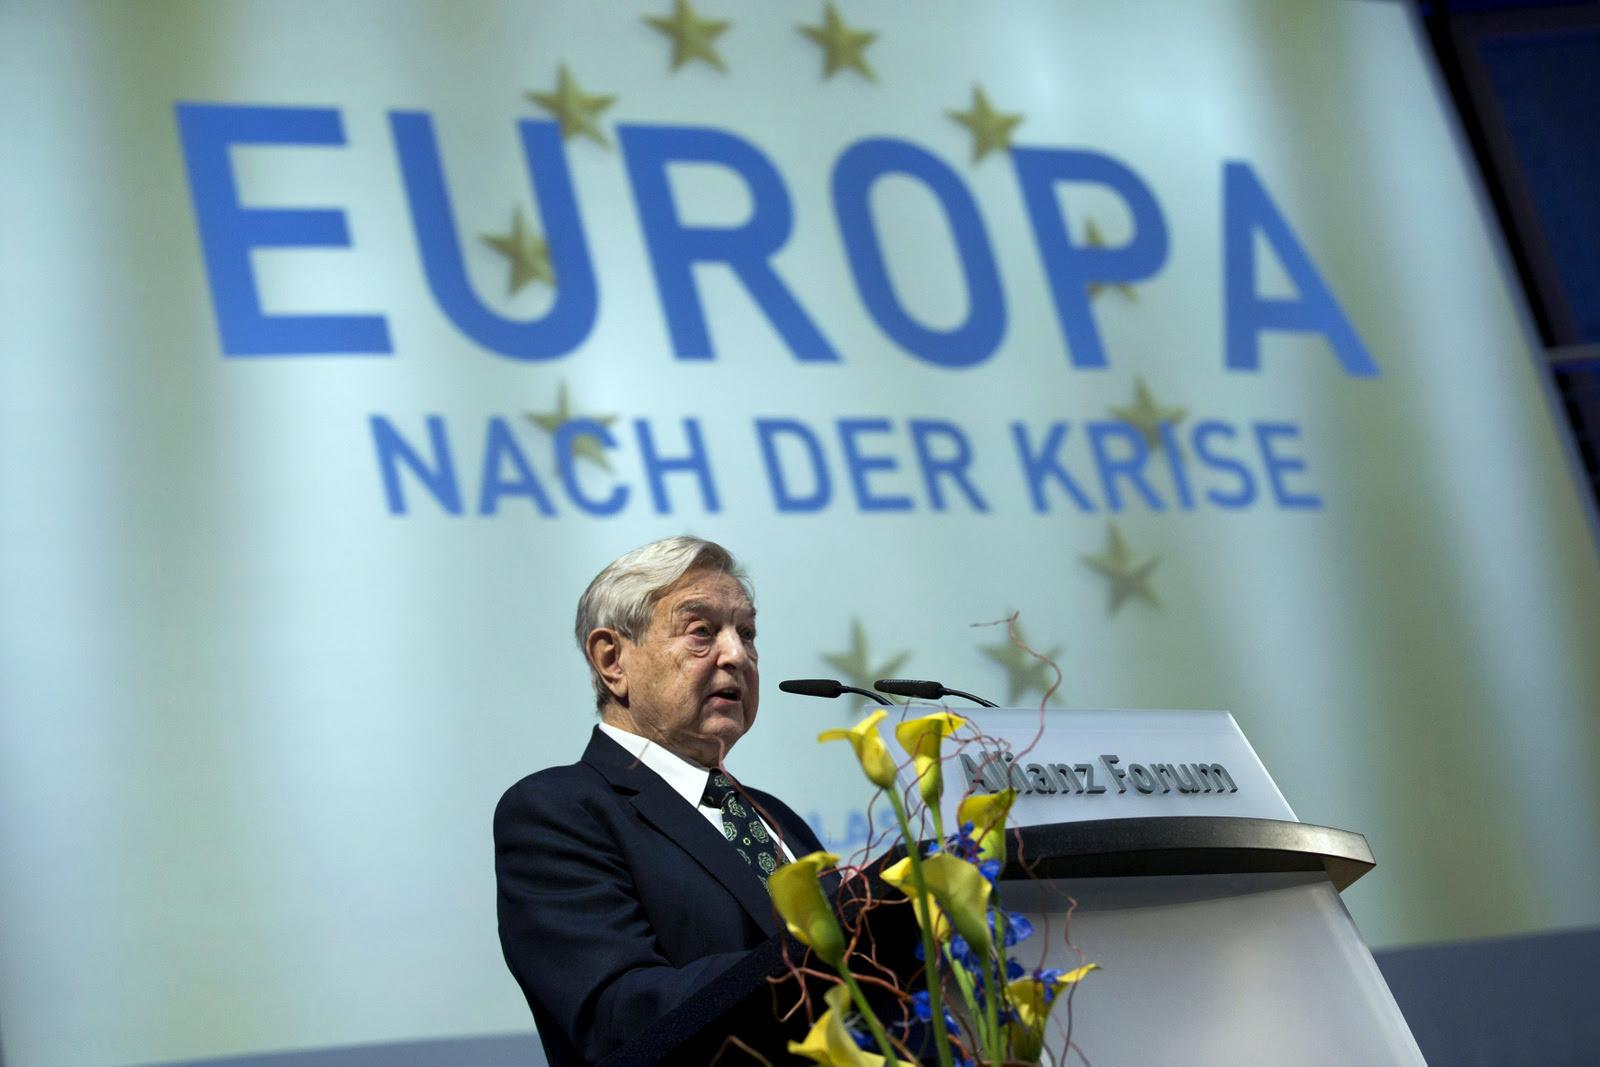 Soros Fund Management Chairman George Soros speaks at the Nicolas Berggruen Conference in Berlin, Germany, Oct. 30, 2012. (AP/Thomas Peter)